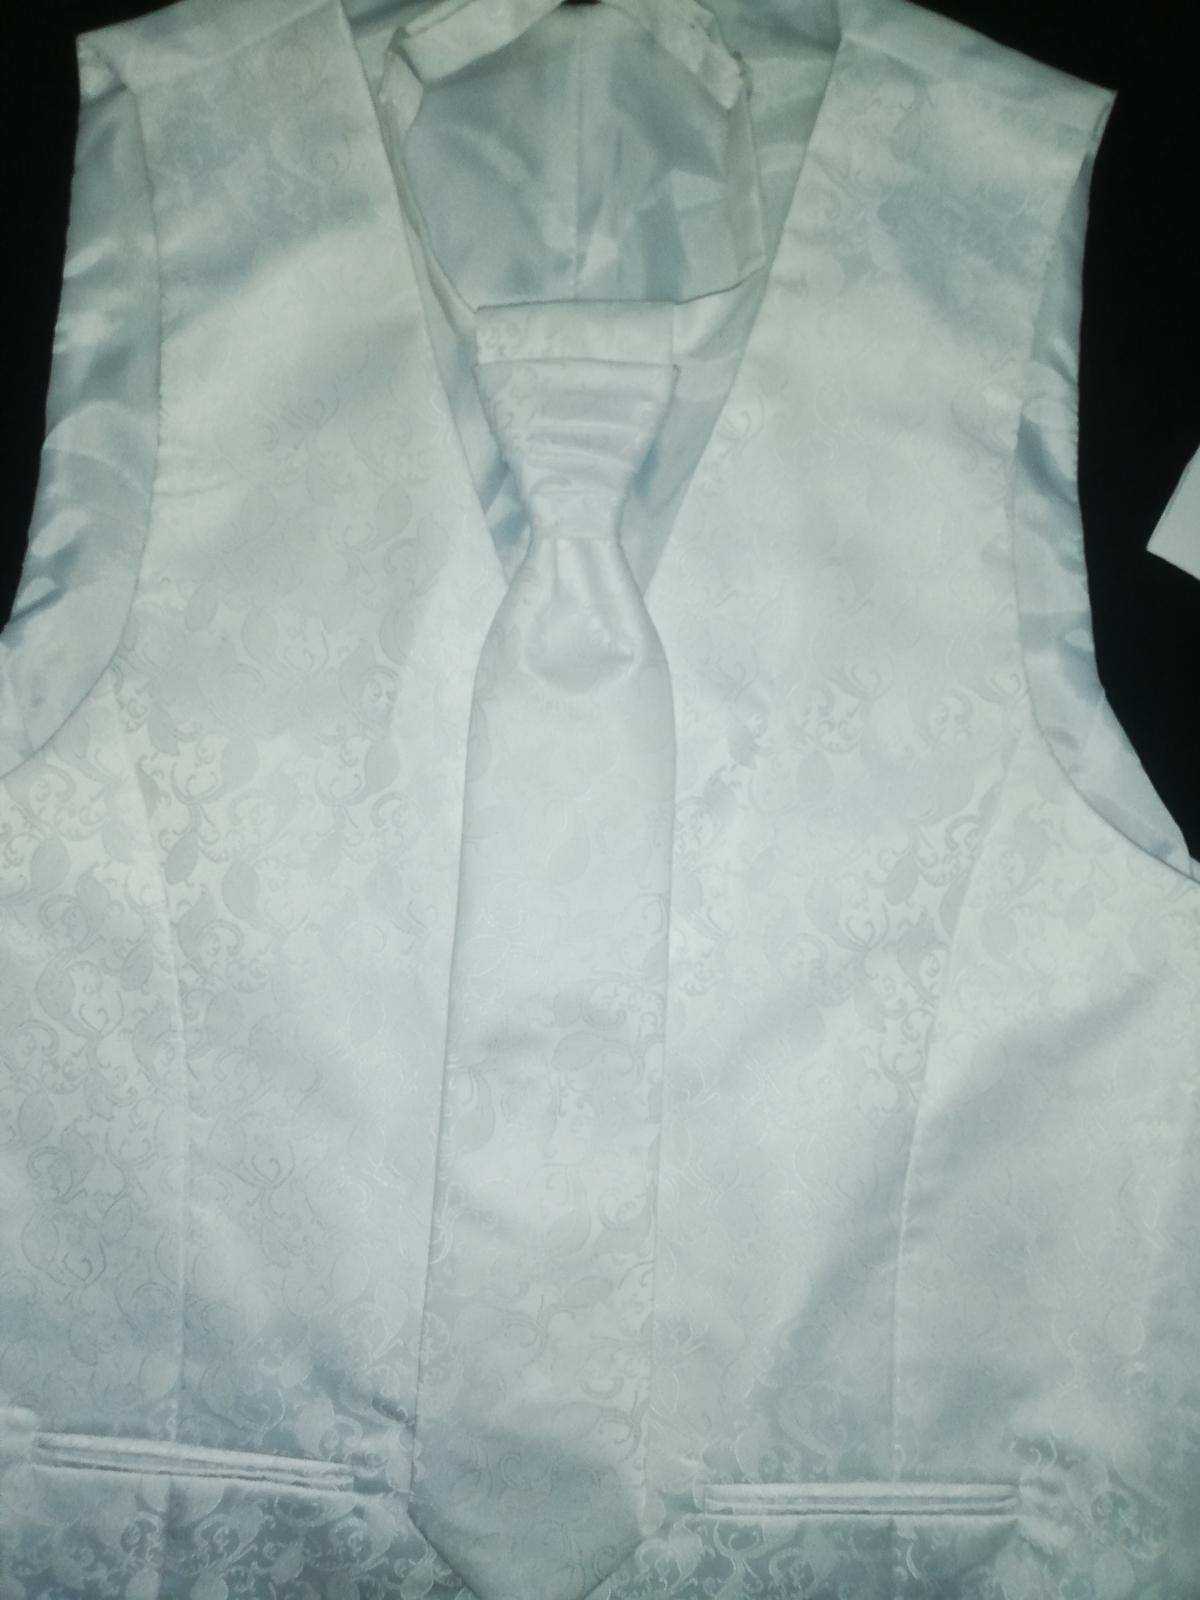 Svadobná vesta s kravatou pre ženícha - Obrázok č. 1